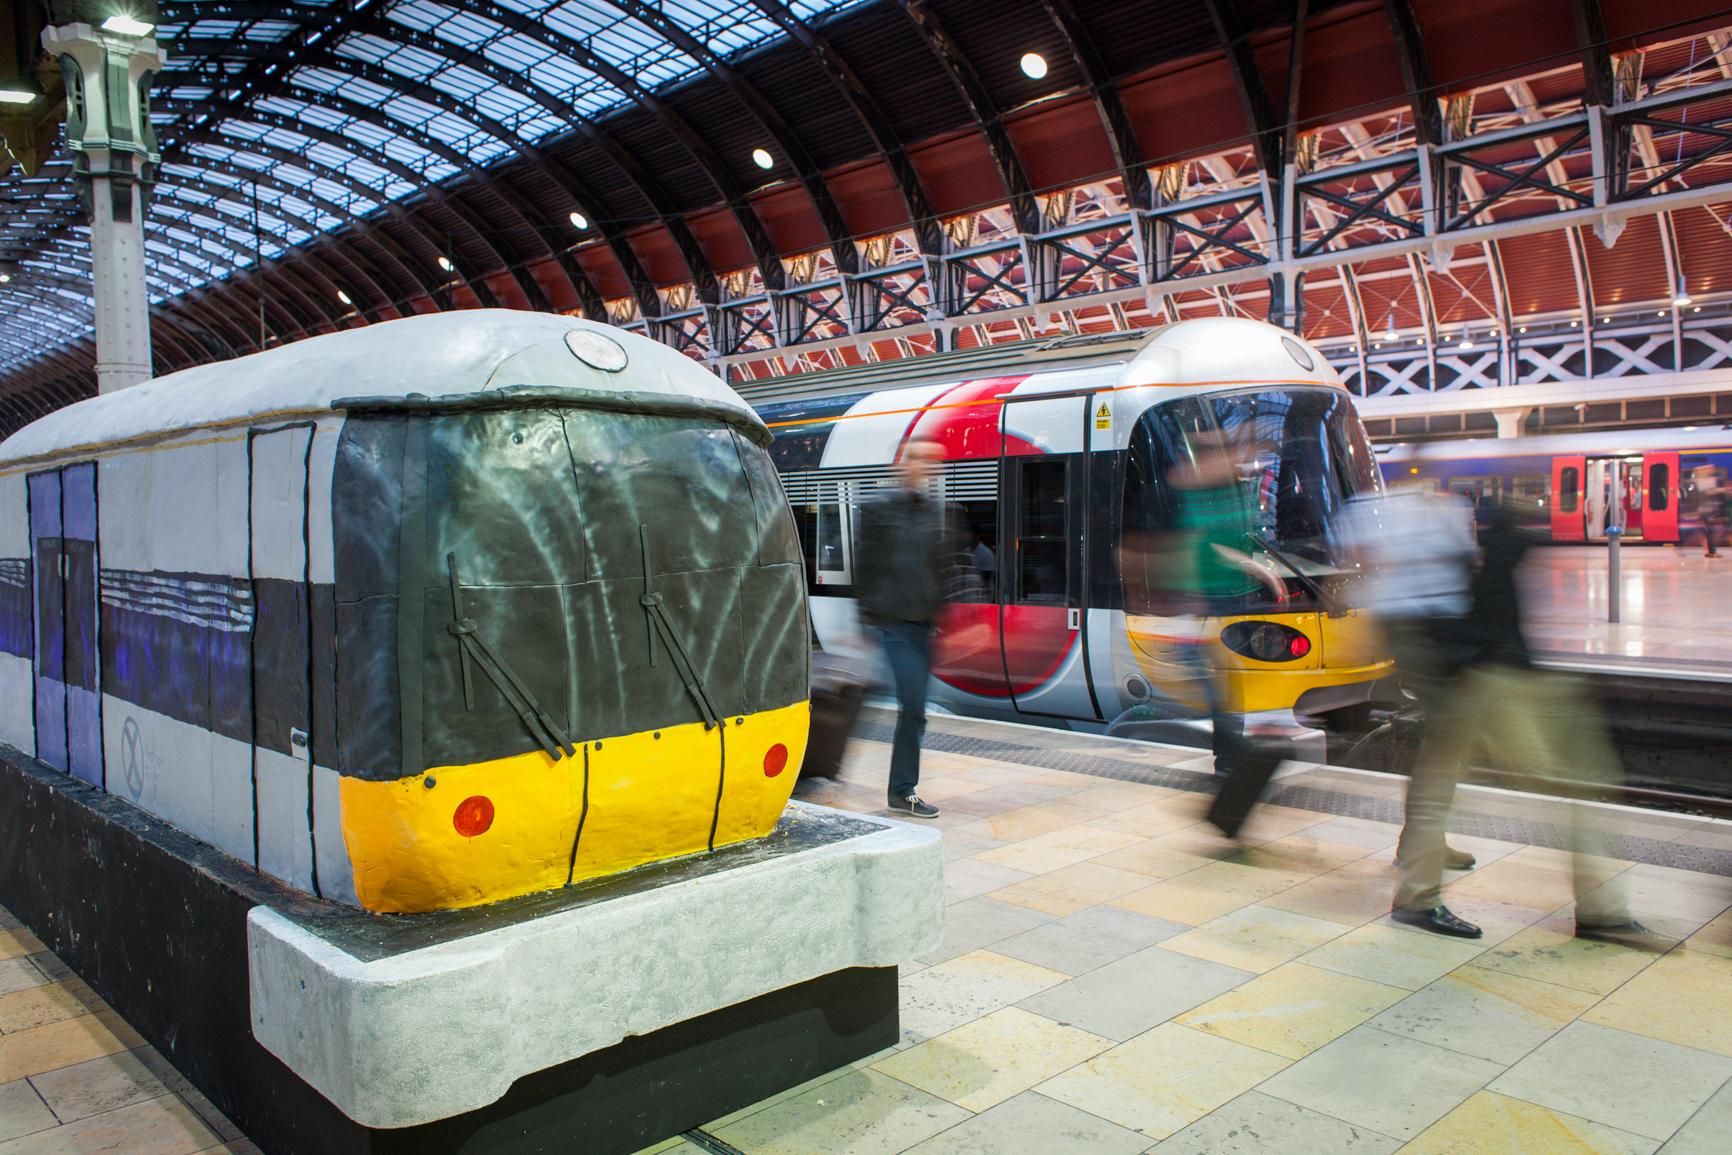 4m Long Cake Train In Paddington Station Boing Boing